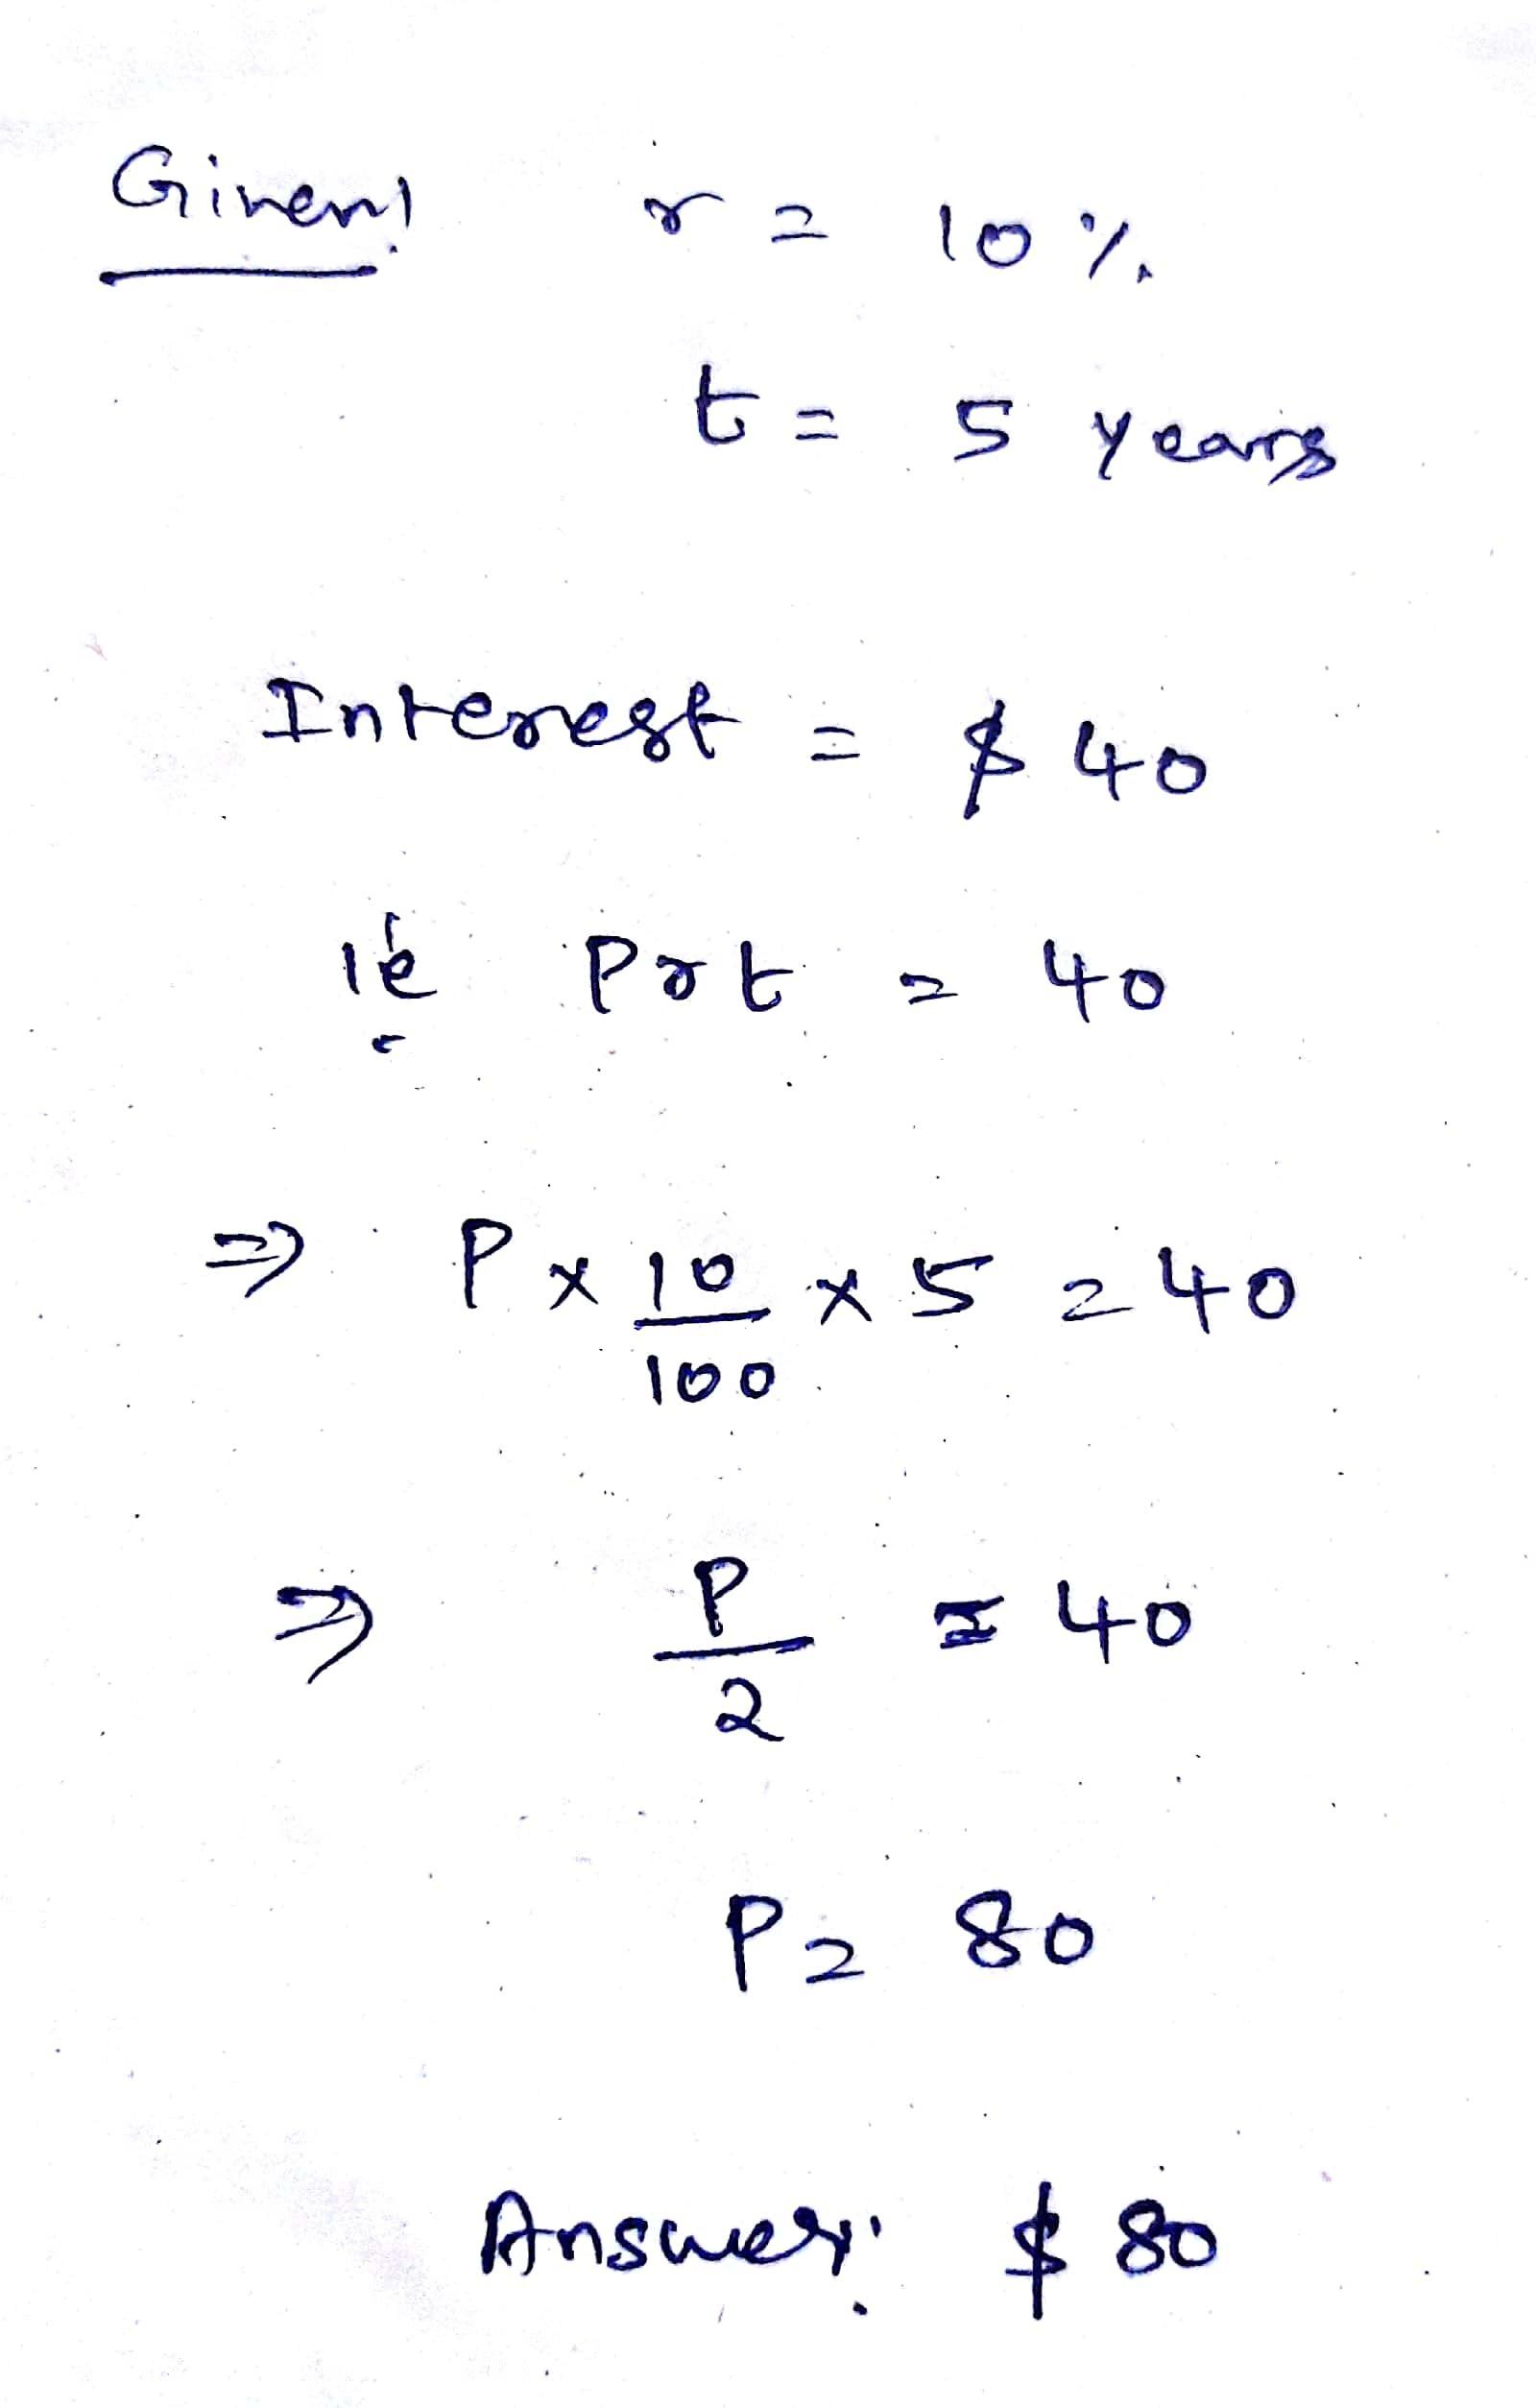 The Simple Interest Formula Is I Prt Where I Represents